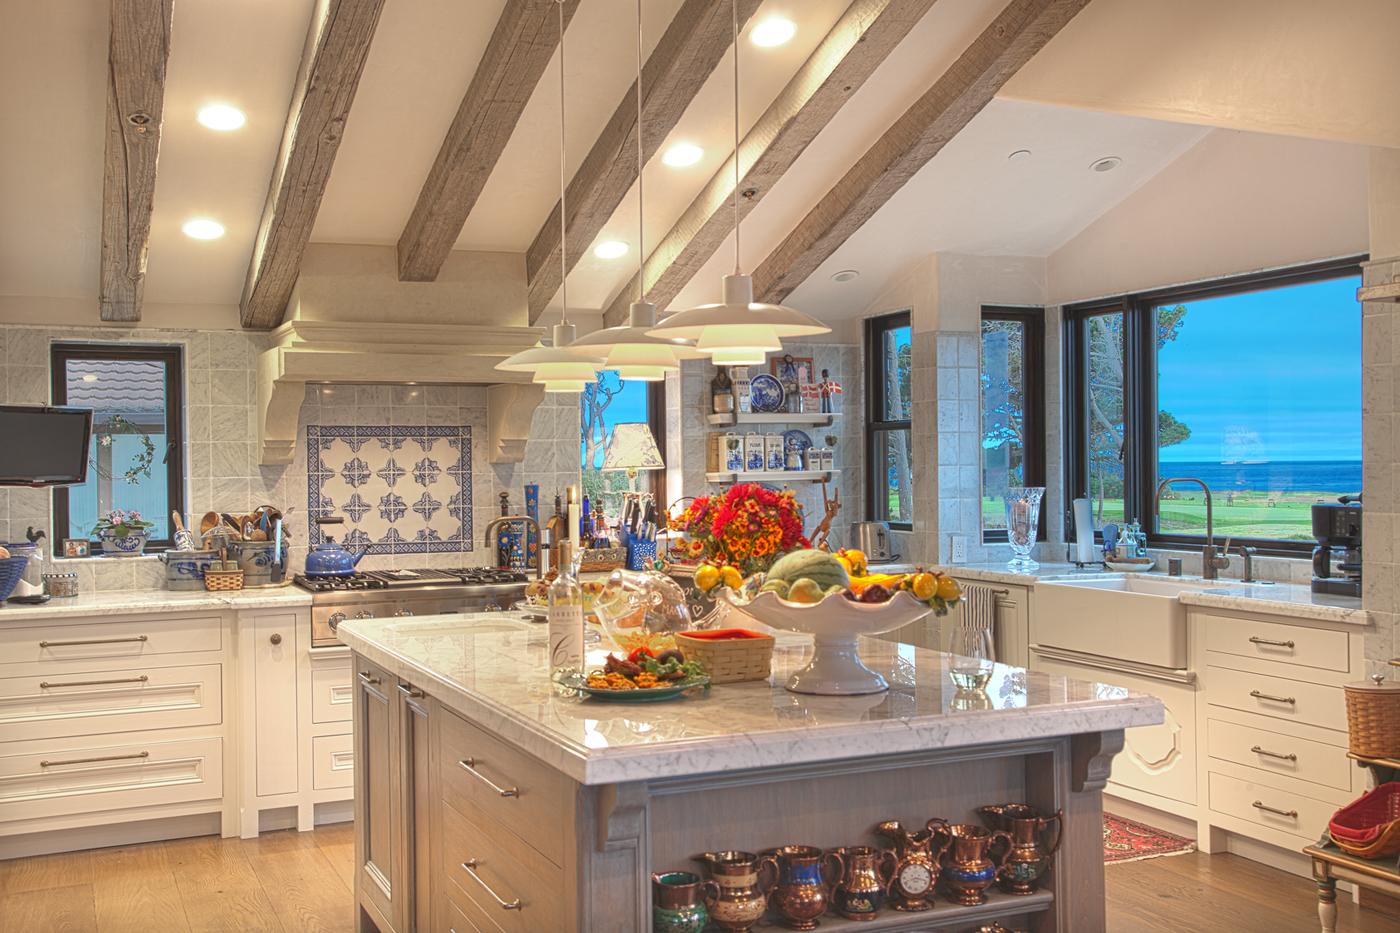 Posey Residence - 6 Kitchen Island.jpg